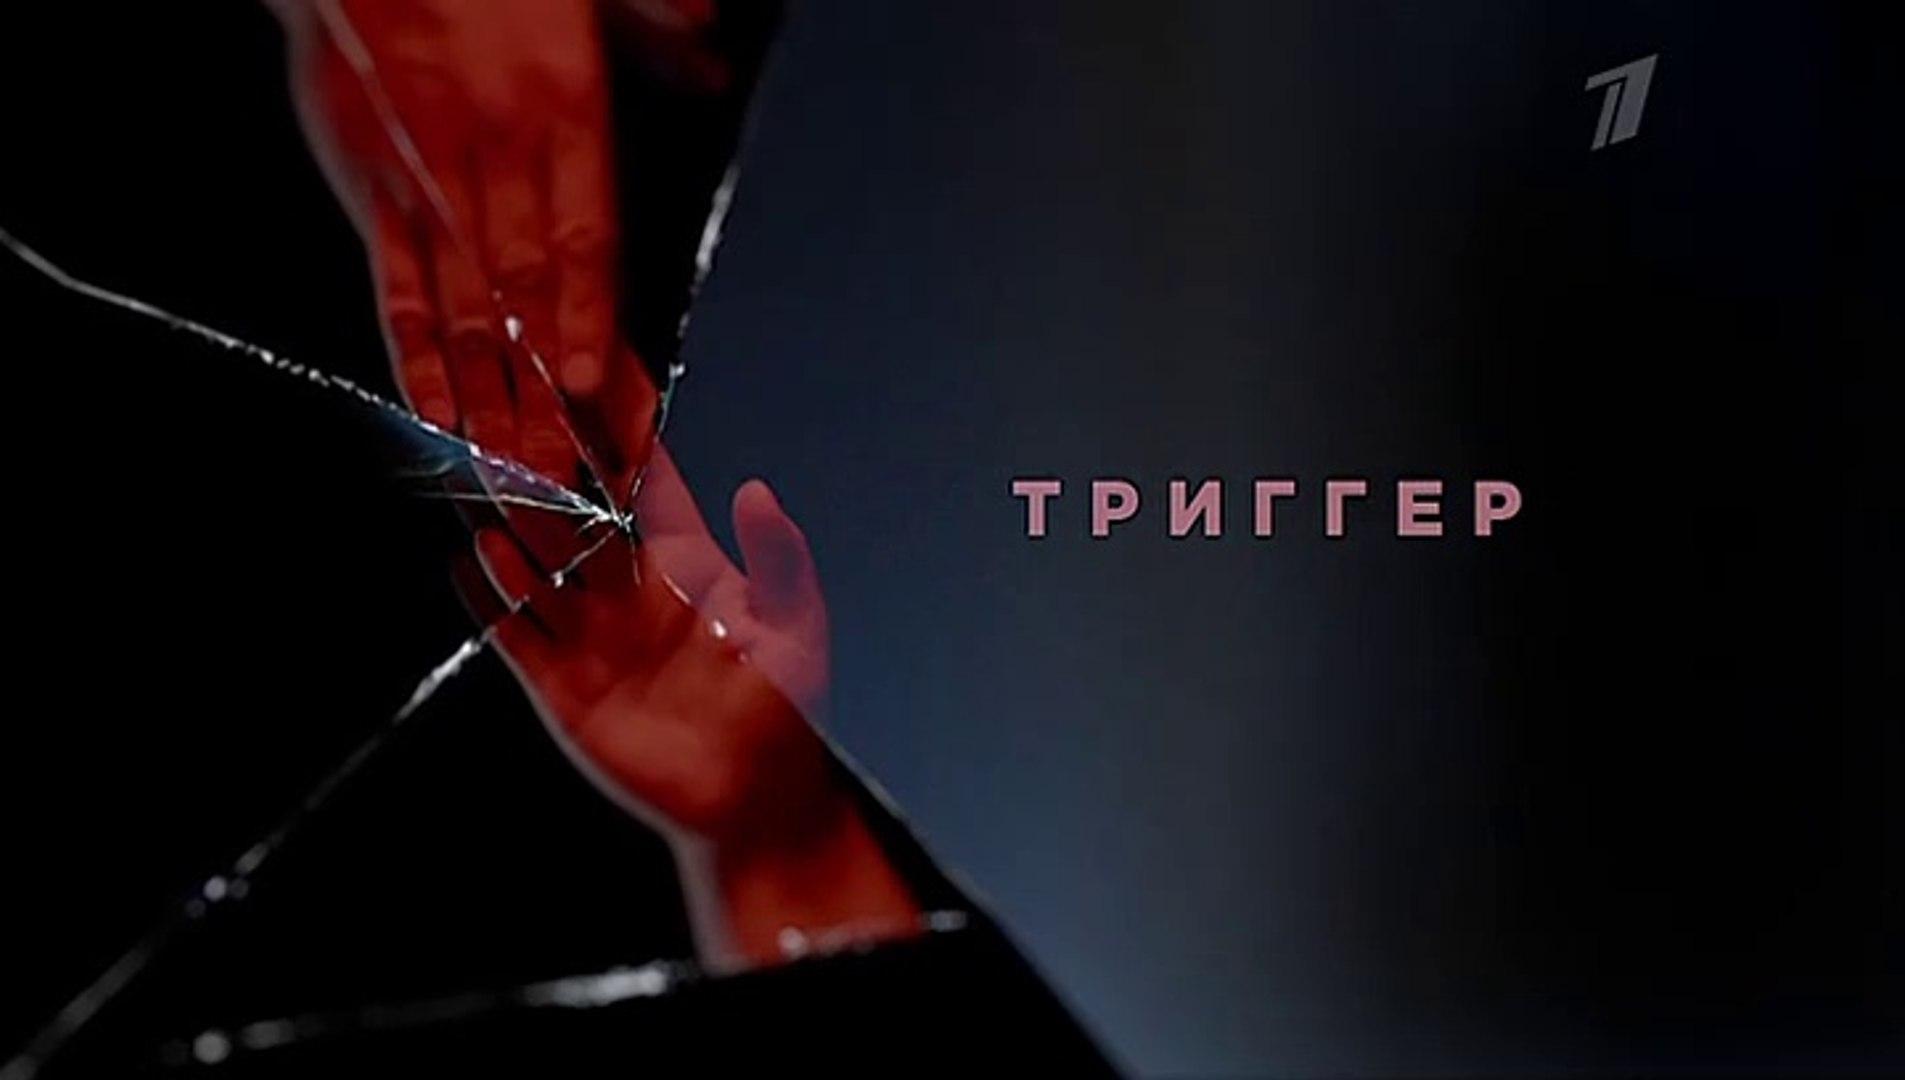 Триггер - 6 серия (2020) HD смотреть онлайн